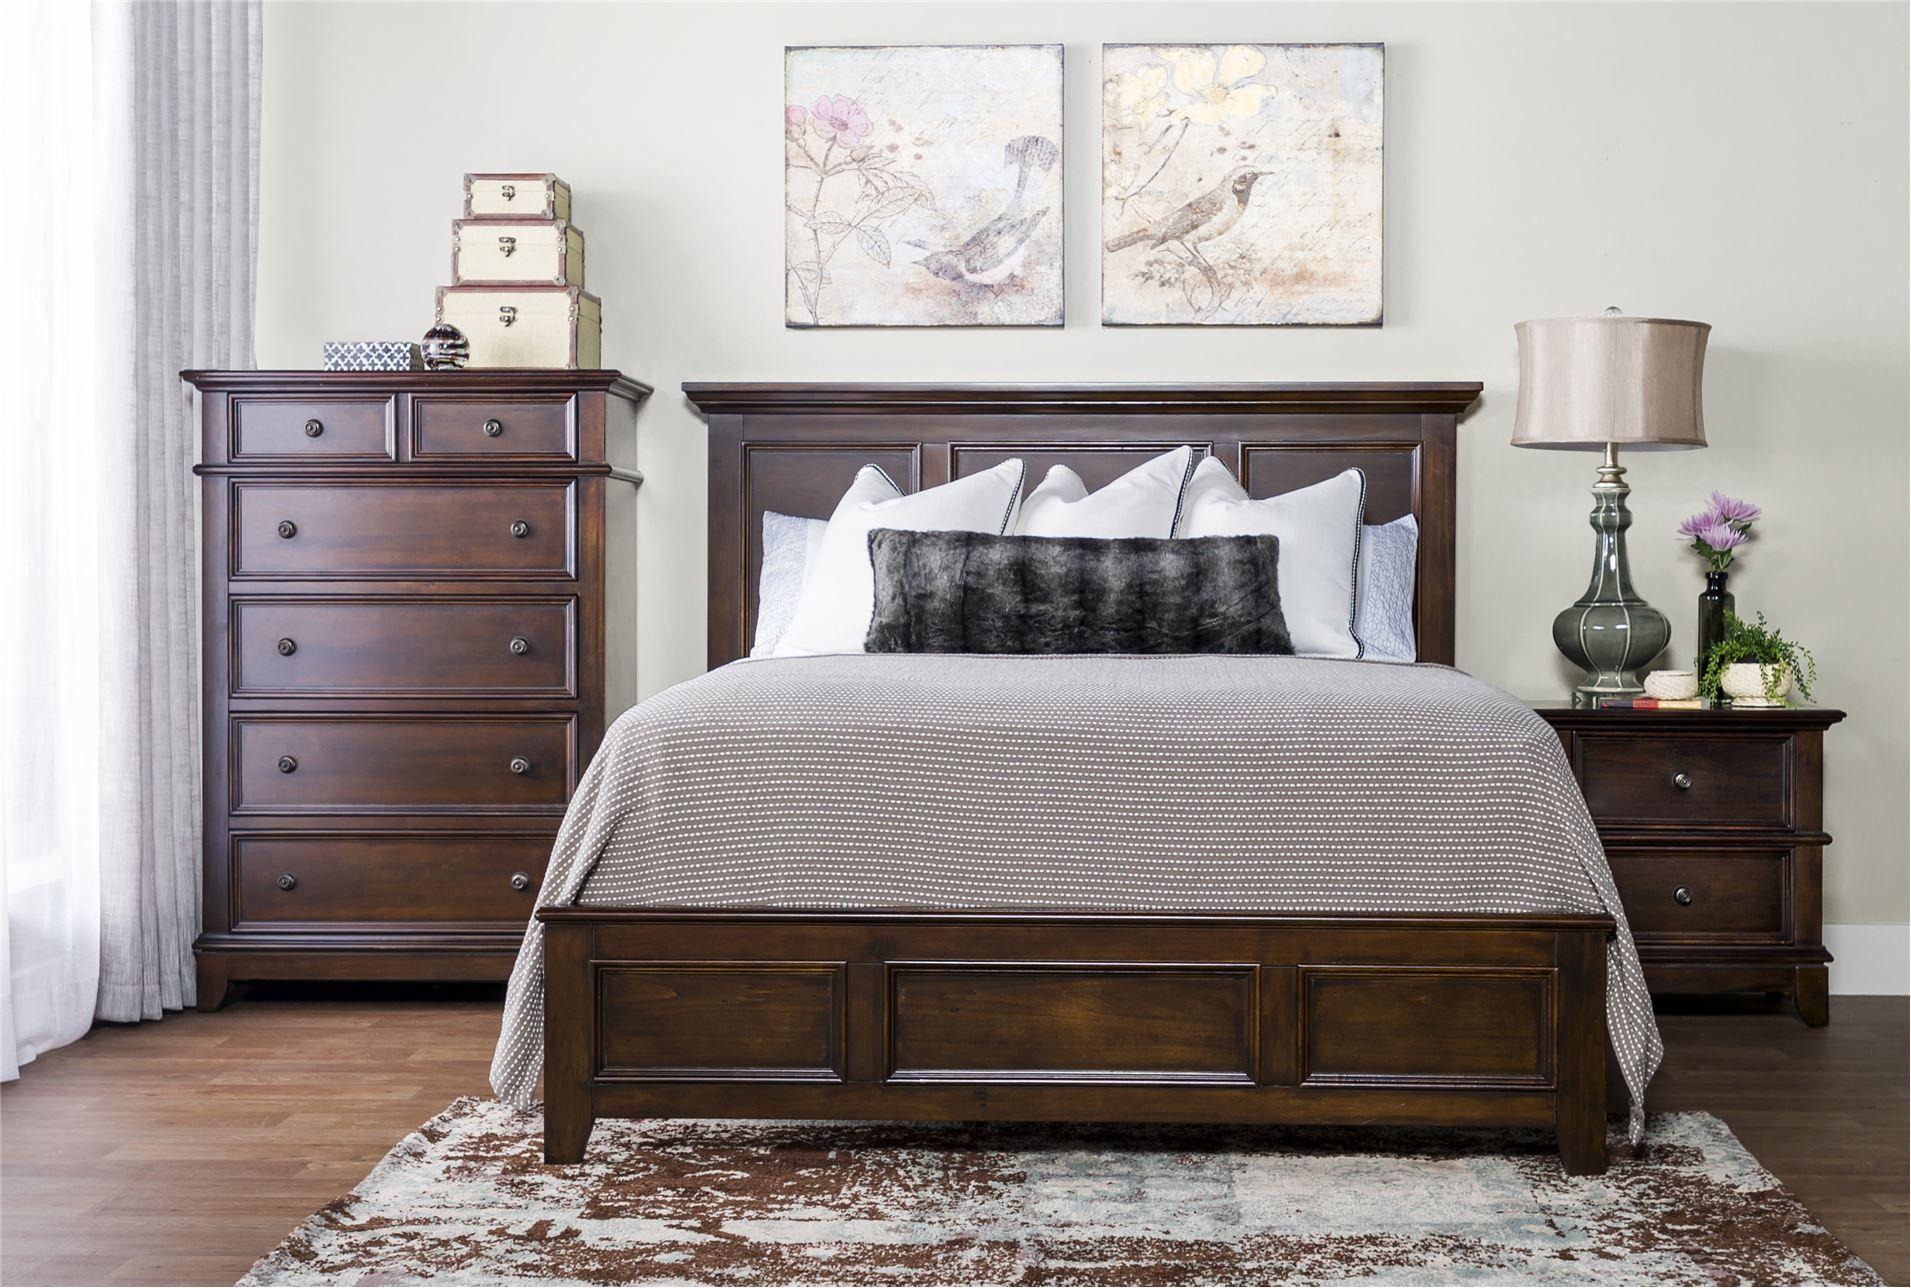 Dalton California King Panel Bed  Living spaces furniture